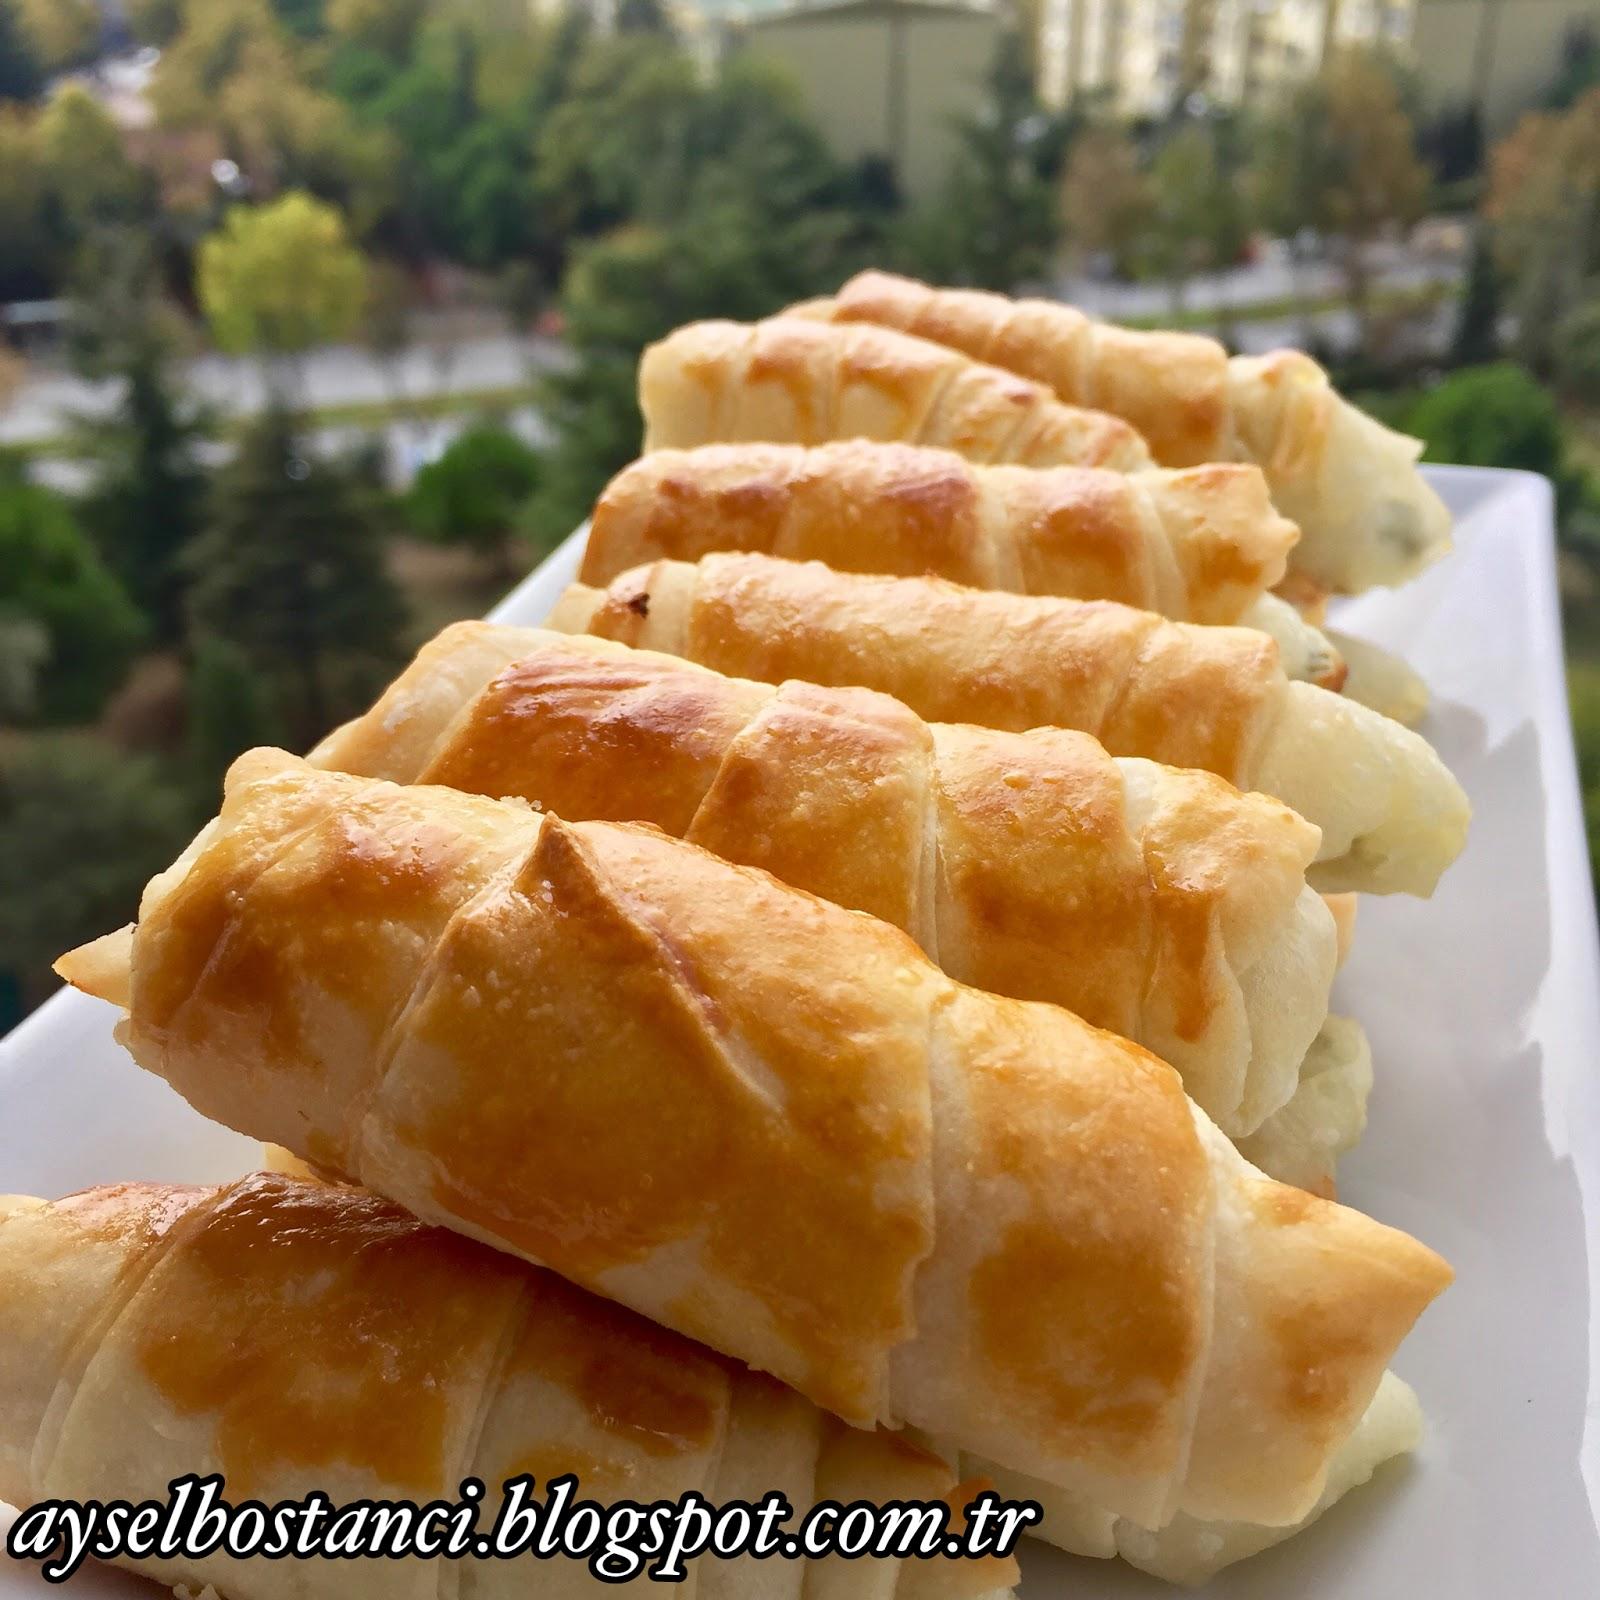 Nişastalı Patatesli Çıtır Börek (El Açması)